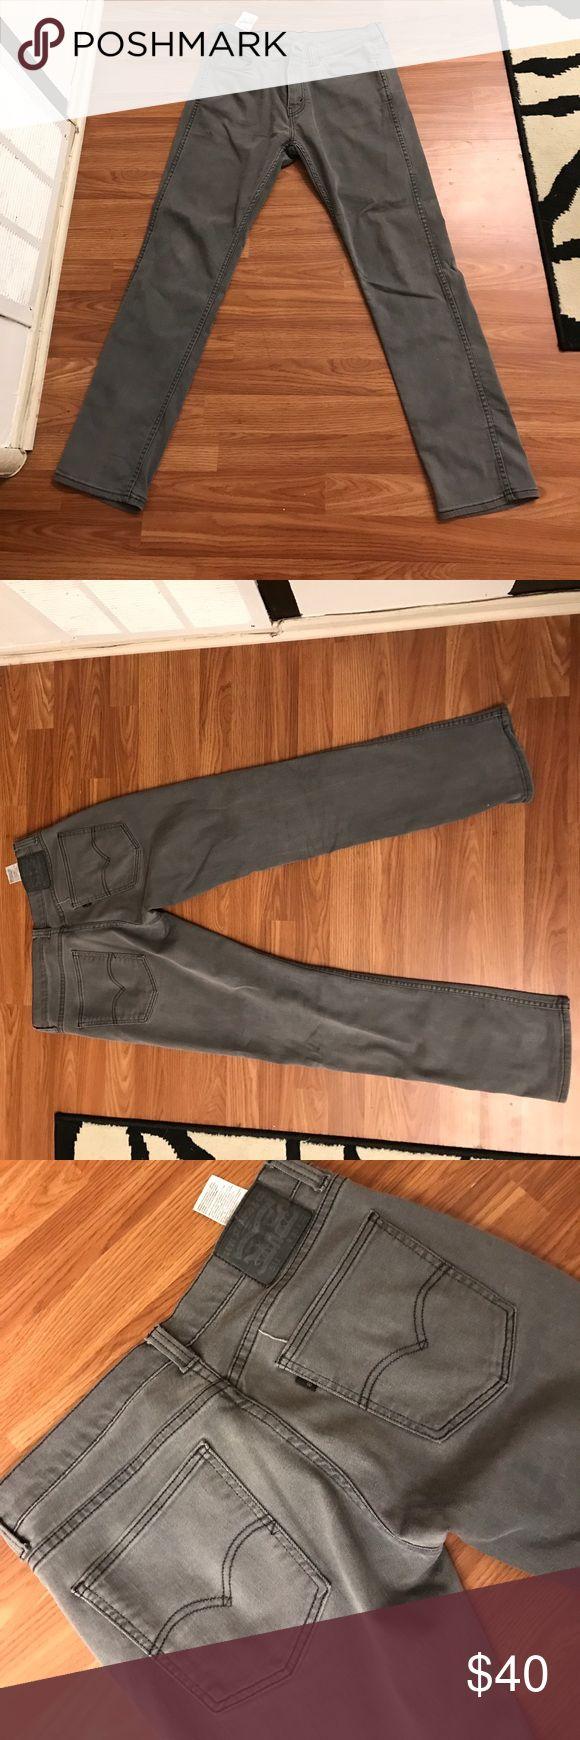 Levi 511 slim fit jeans Levi 511 slim fit jeans 33w 32L. Great jeans. Amazing feel! Levi's Jeans Slim